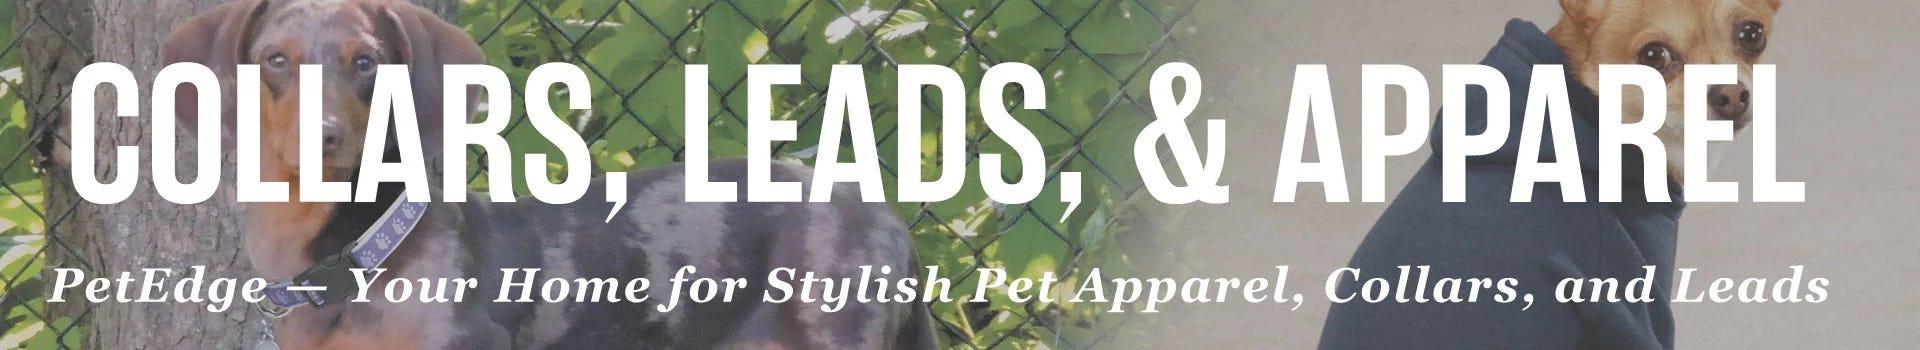 Collars, Leads, & Pet Apparel